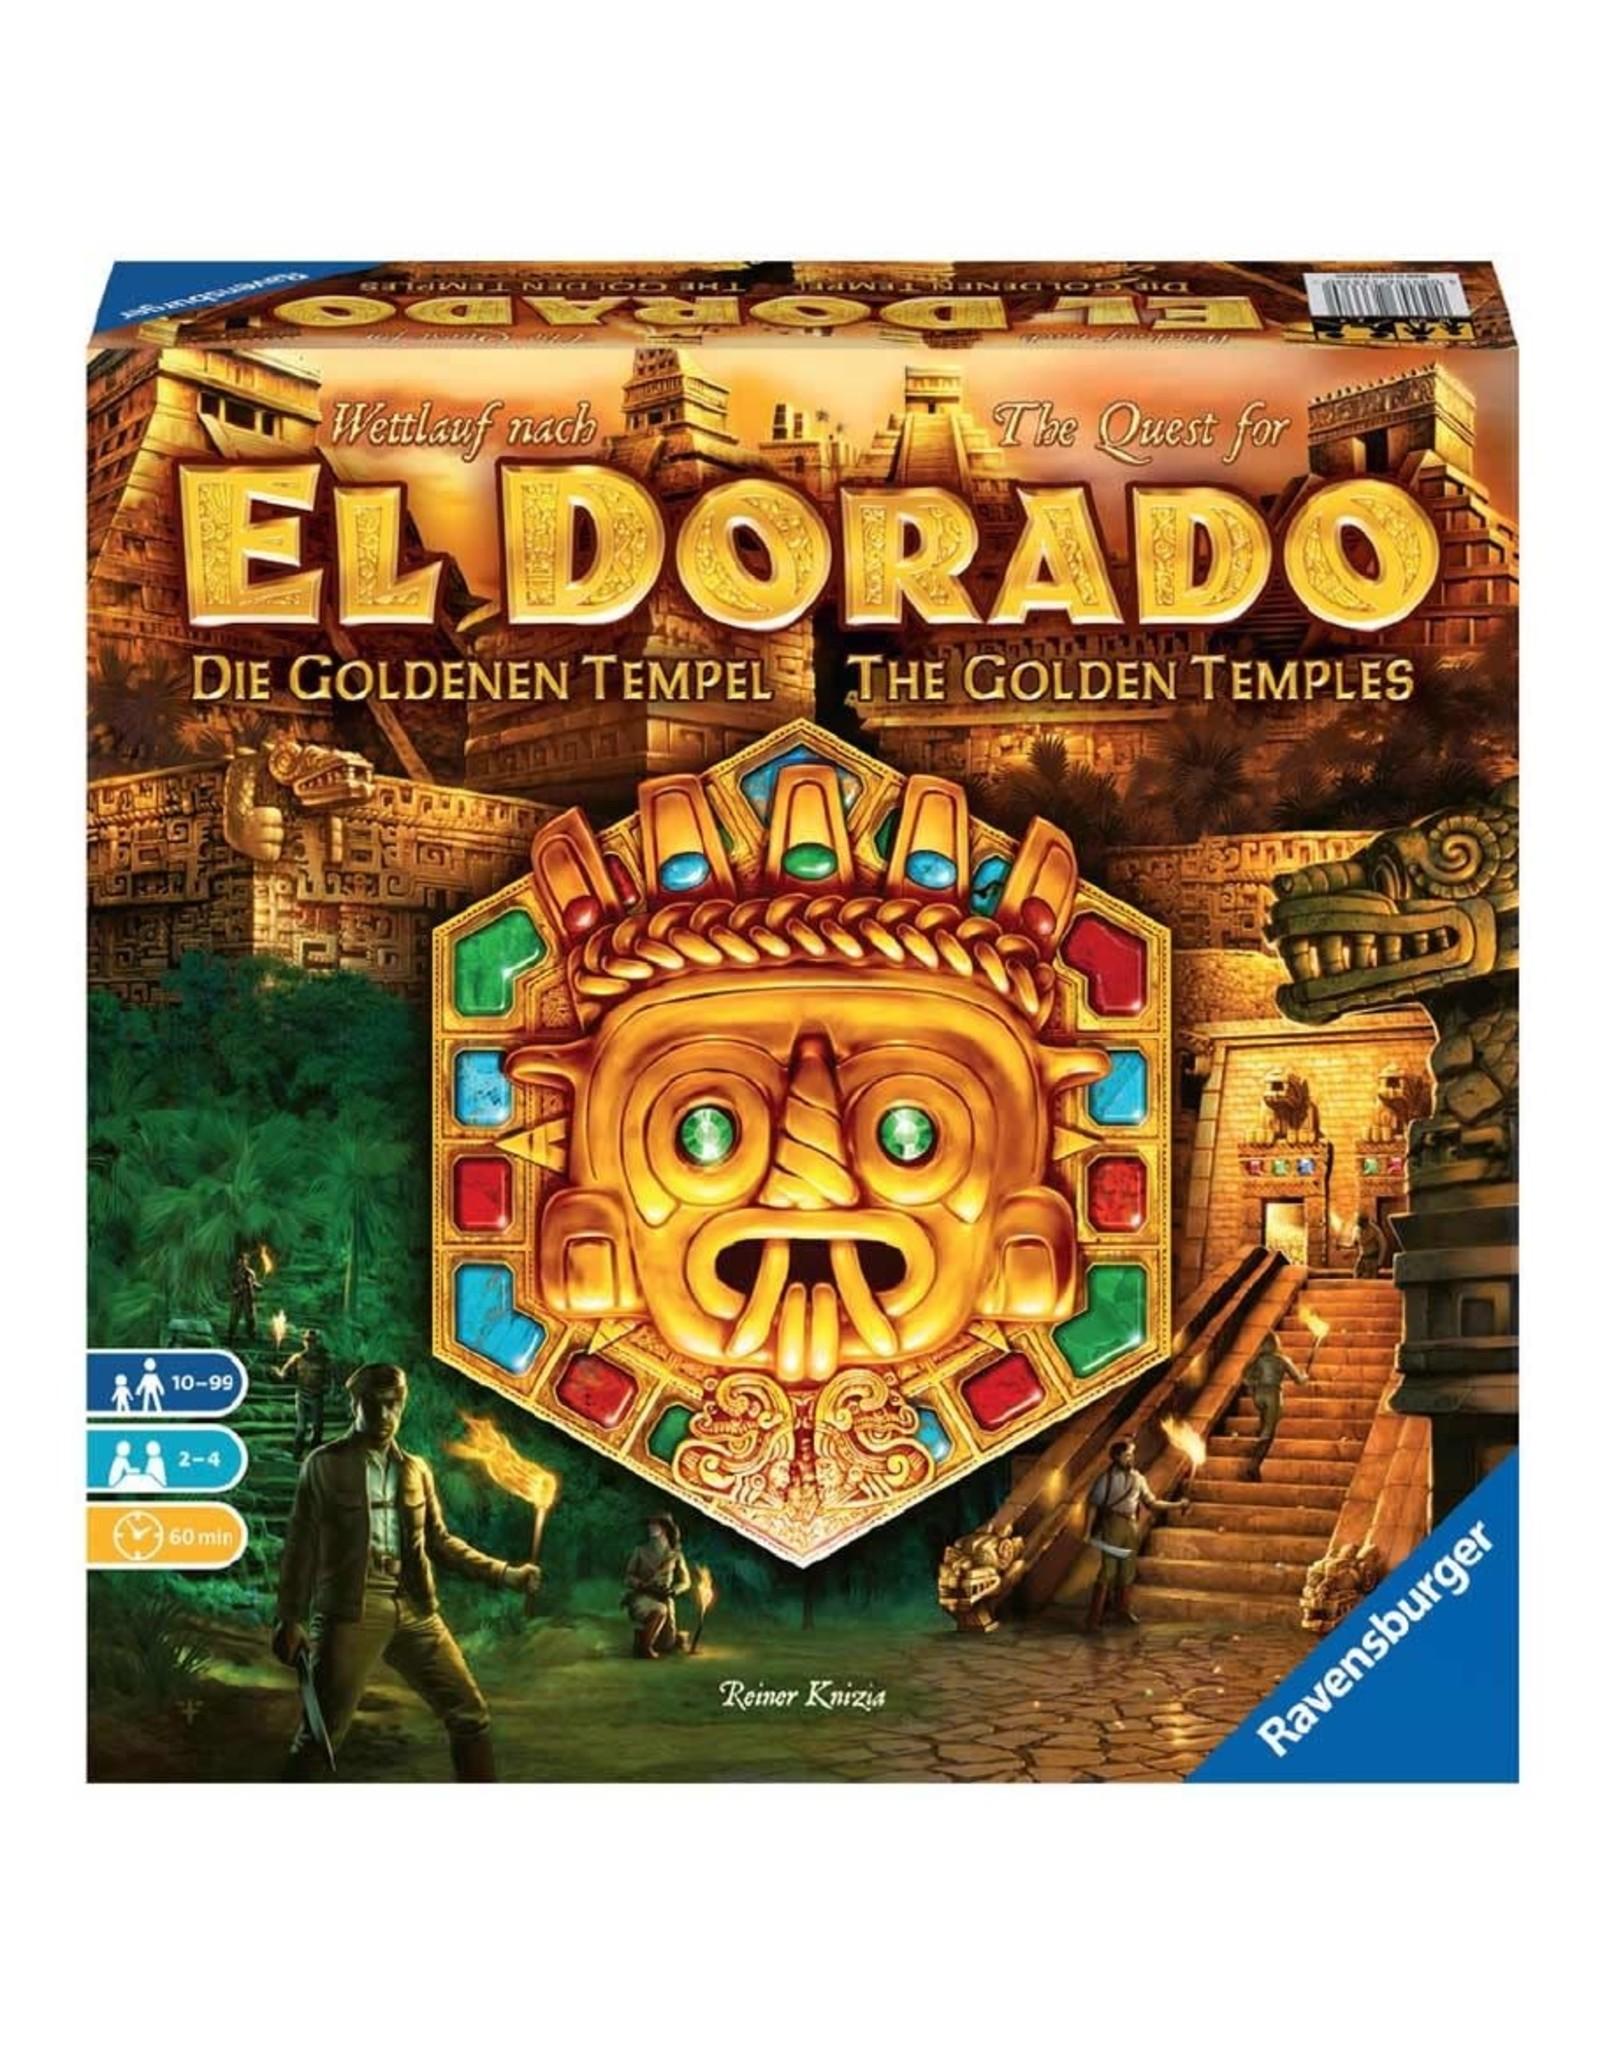 Ravensburger The Quest for El Dorado: The Golden Temples Expansion